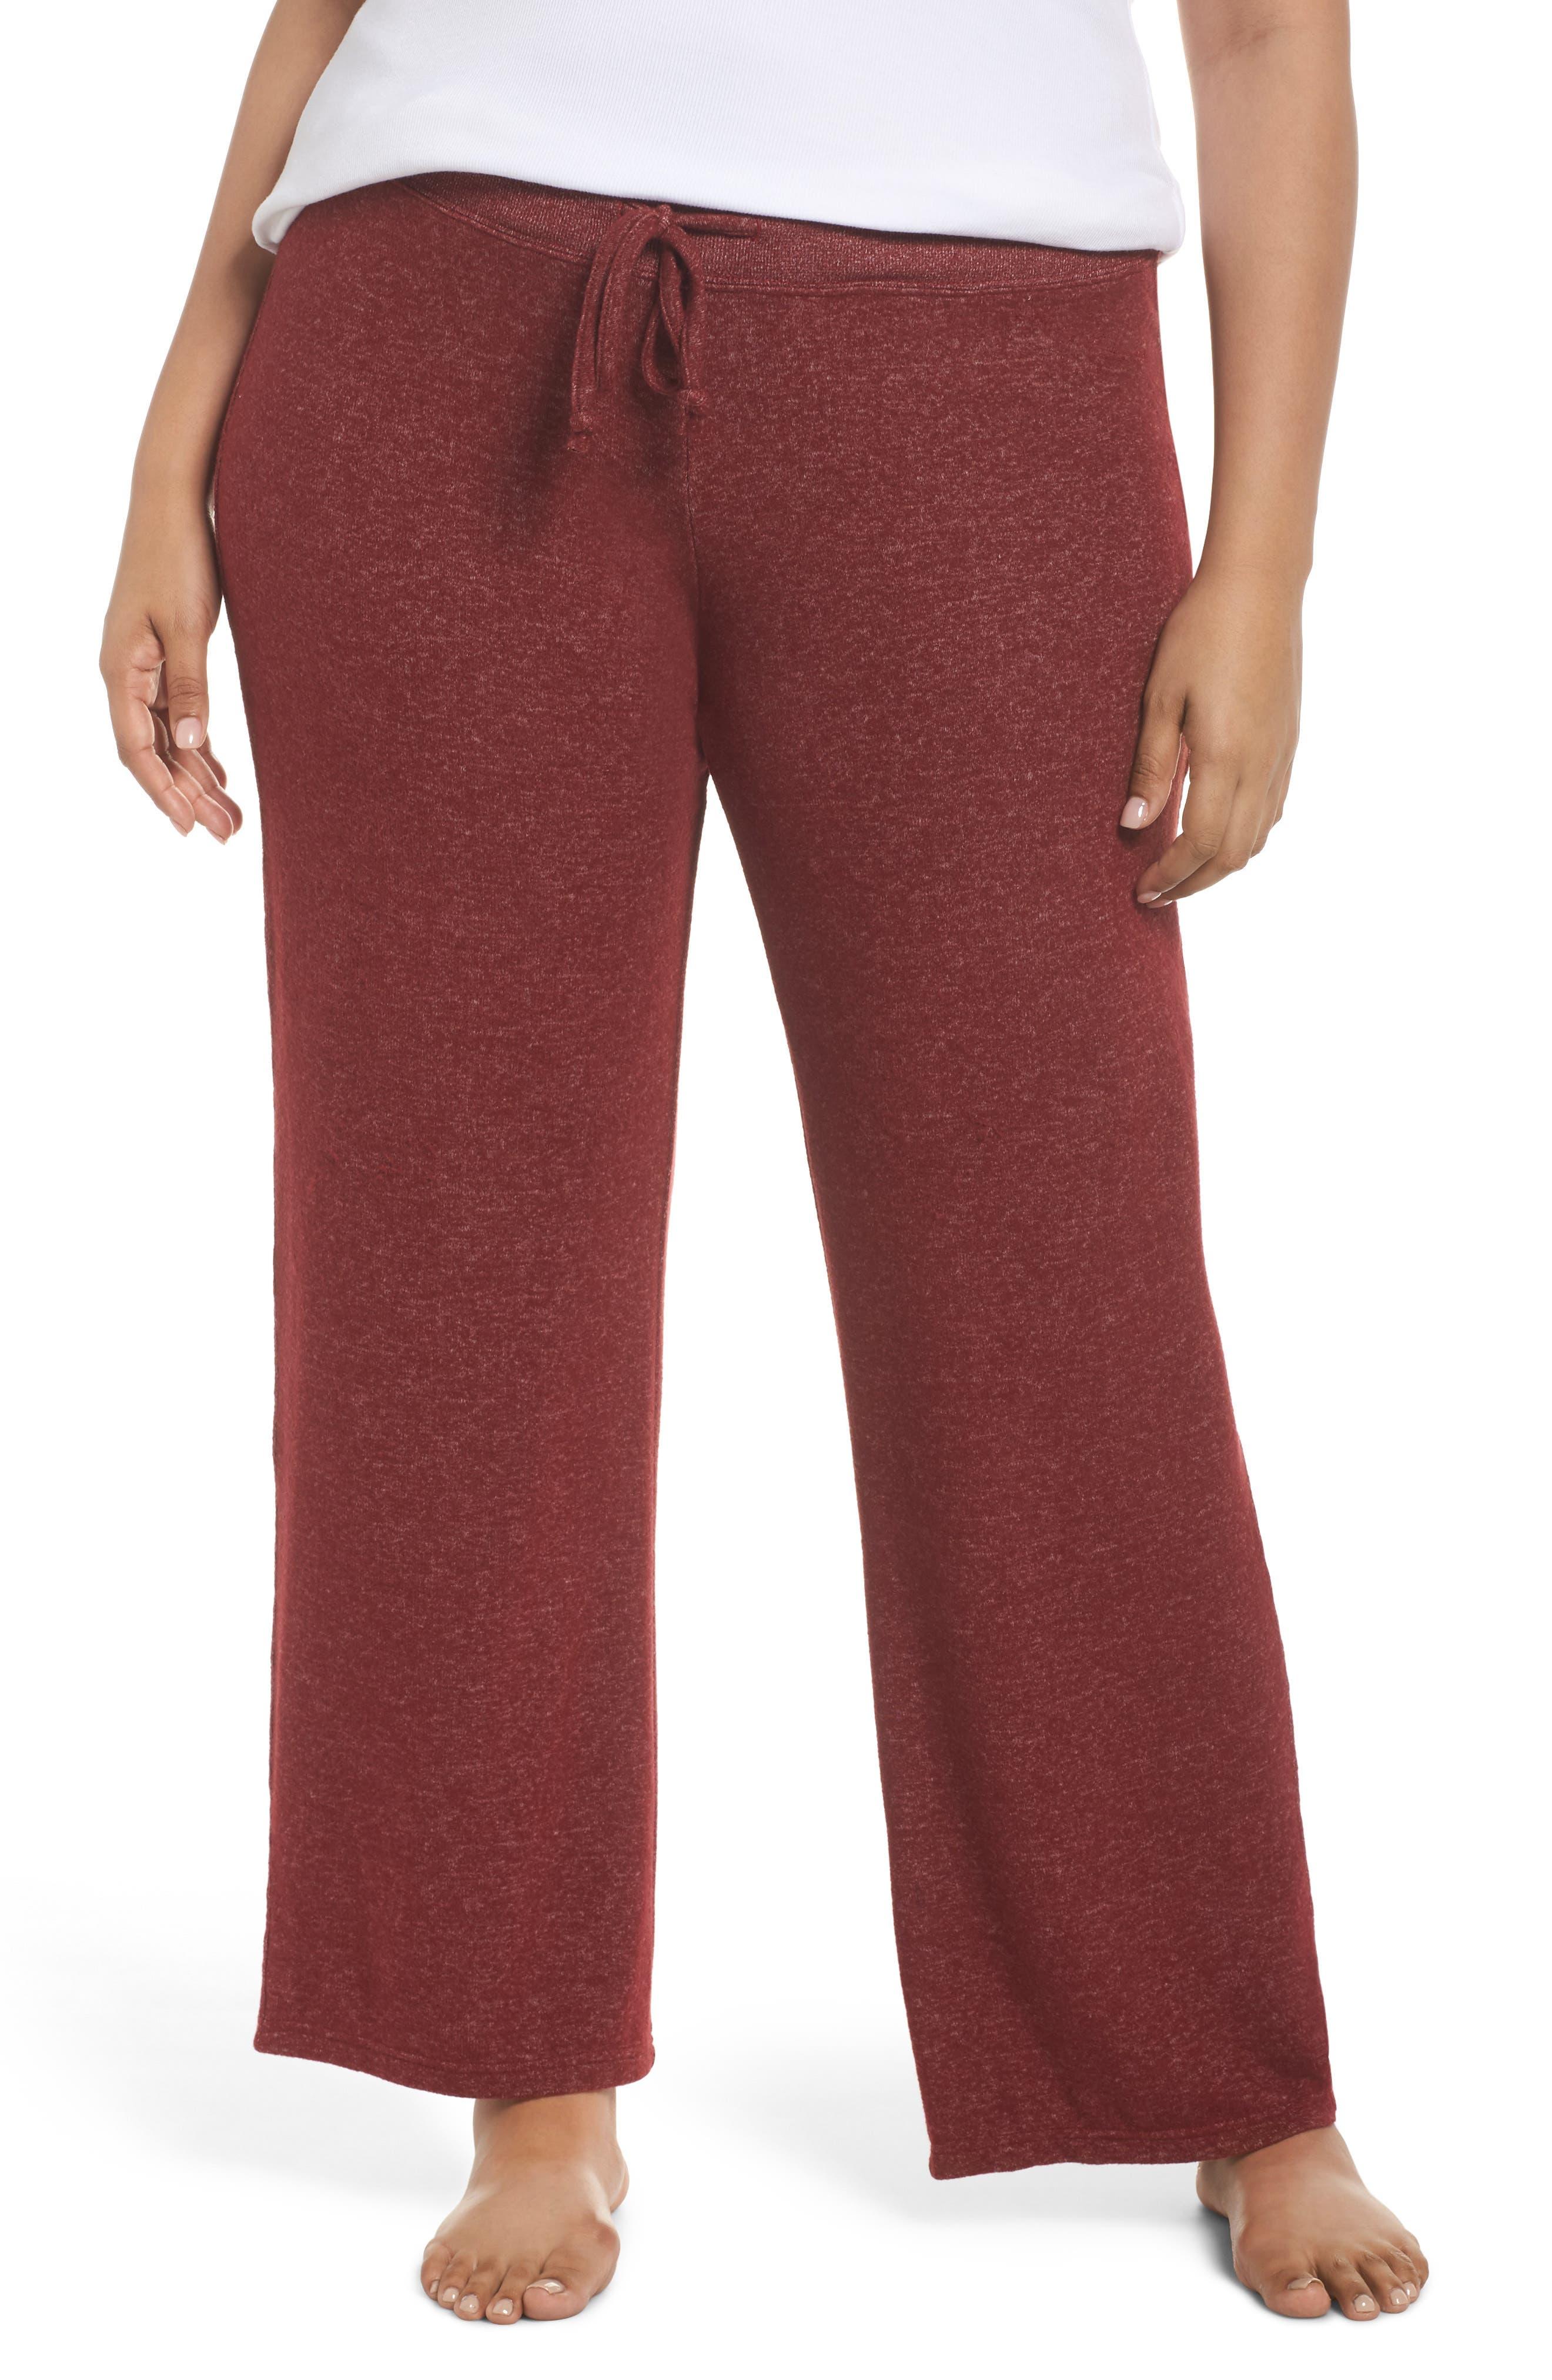 'Best Boyfriend' Brushed Hacci Lounge Pants,                         Main,                         color, Red Grape